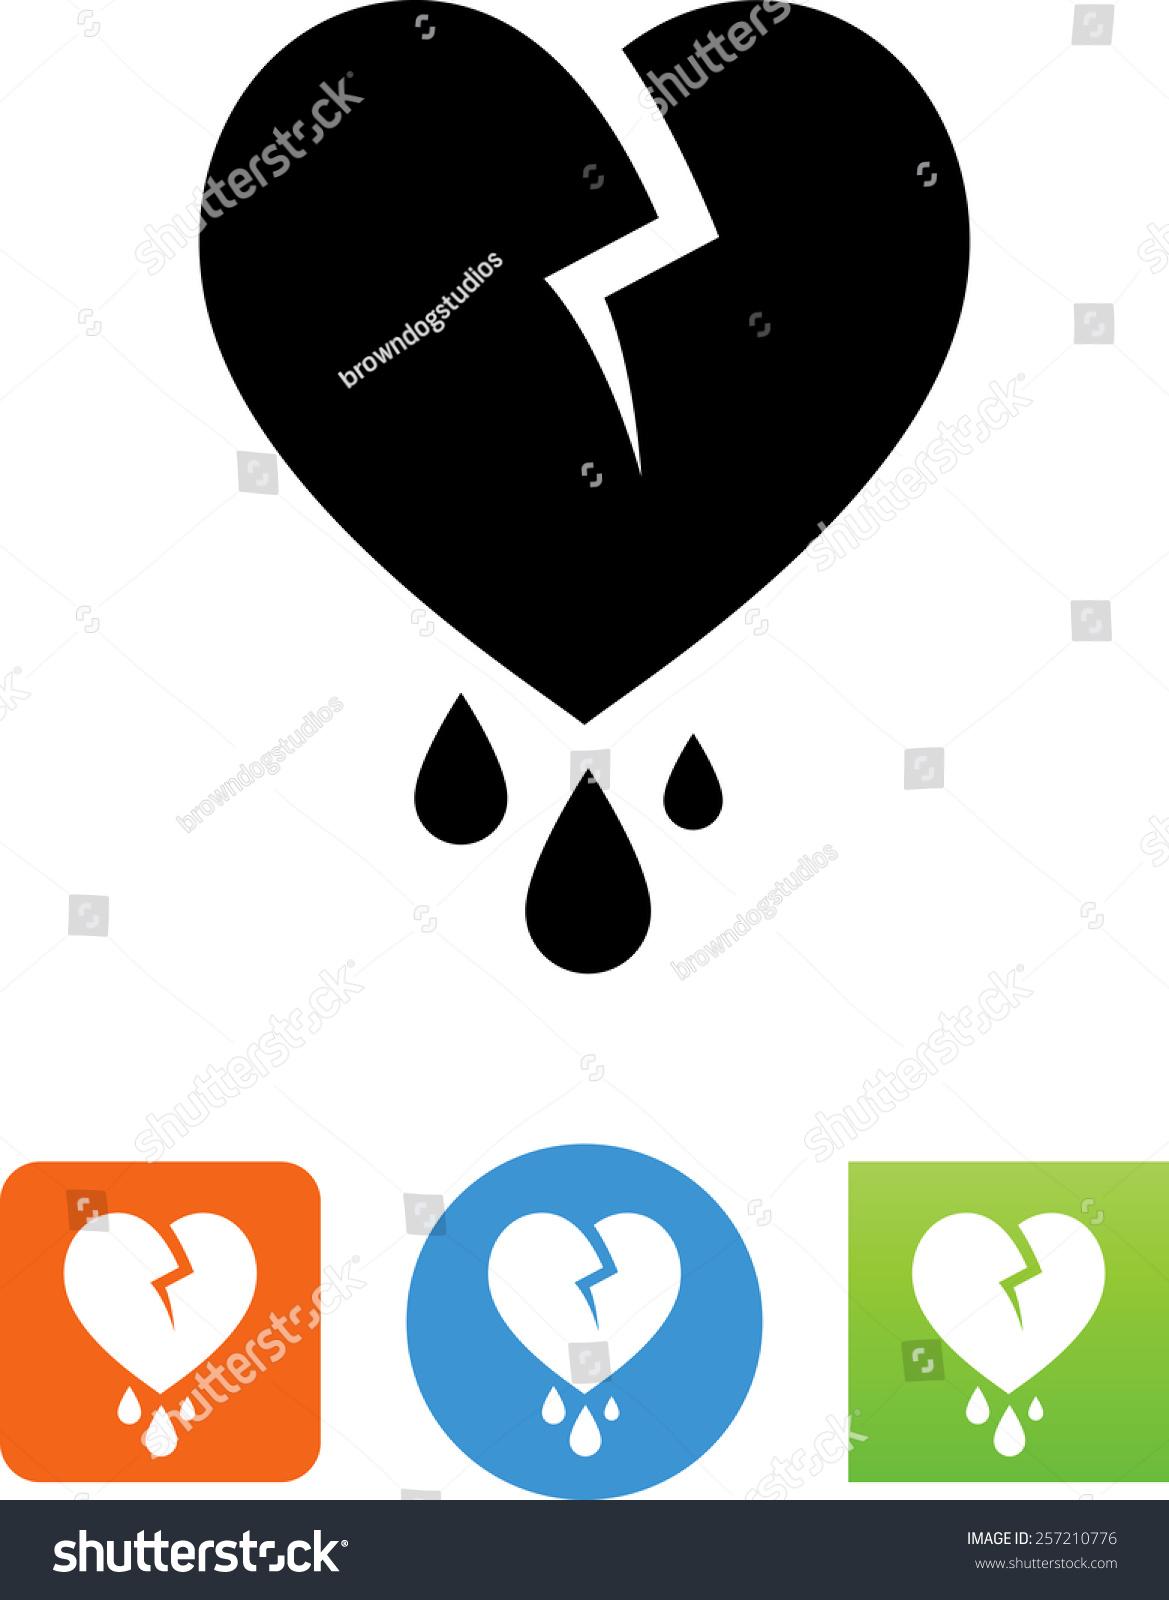 Bleeding heart icon stock vector 257210776 shutterstock bleeding heart icon buycottarizona